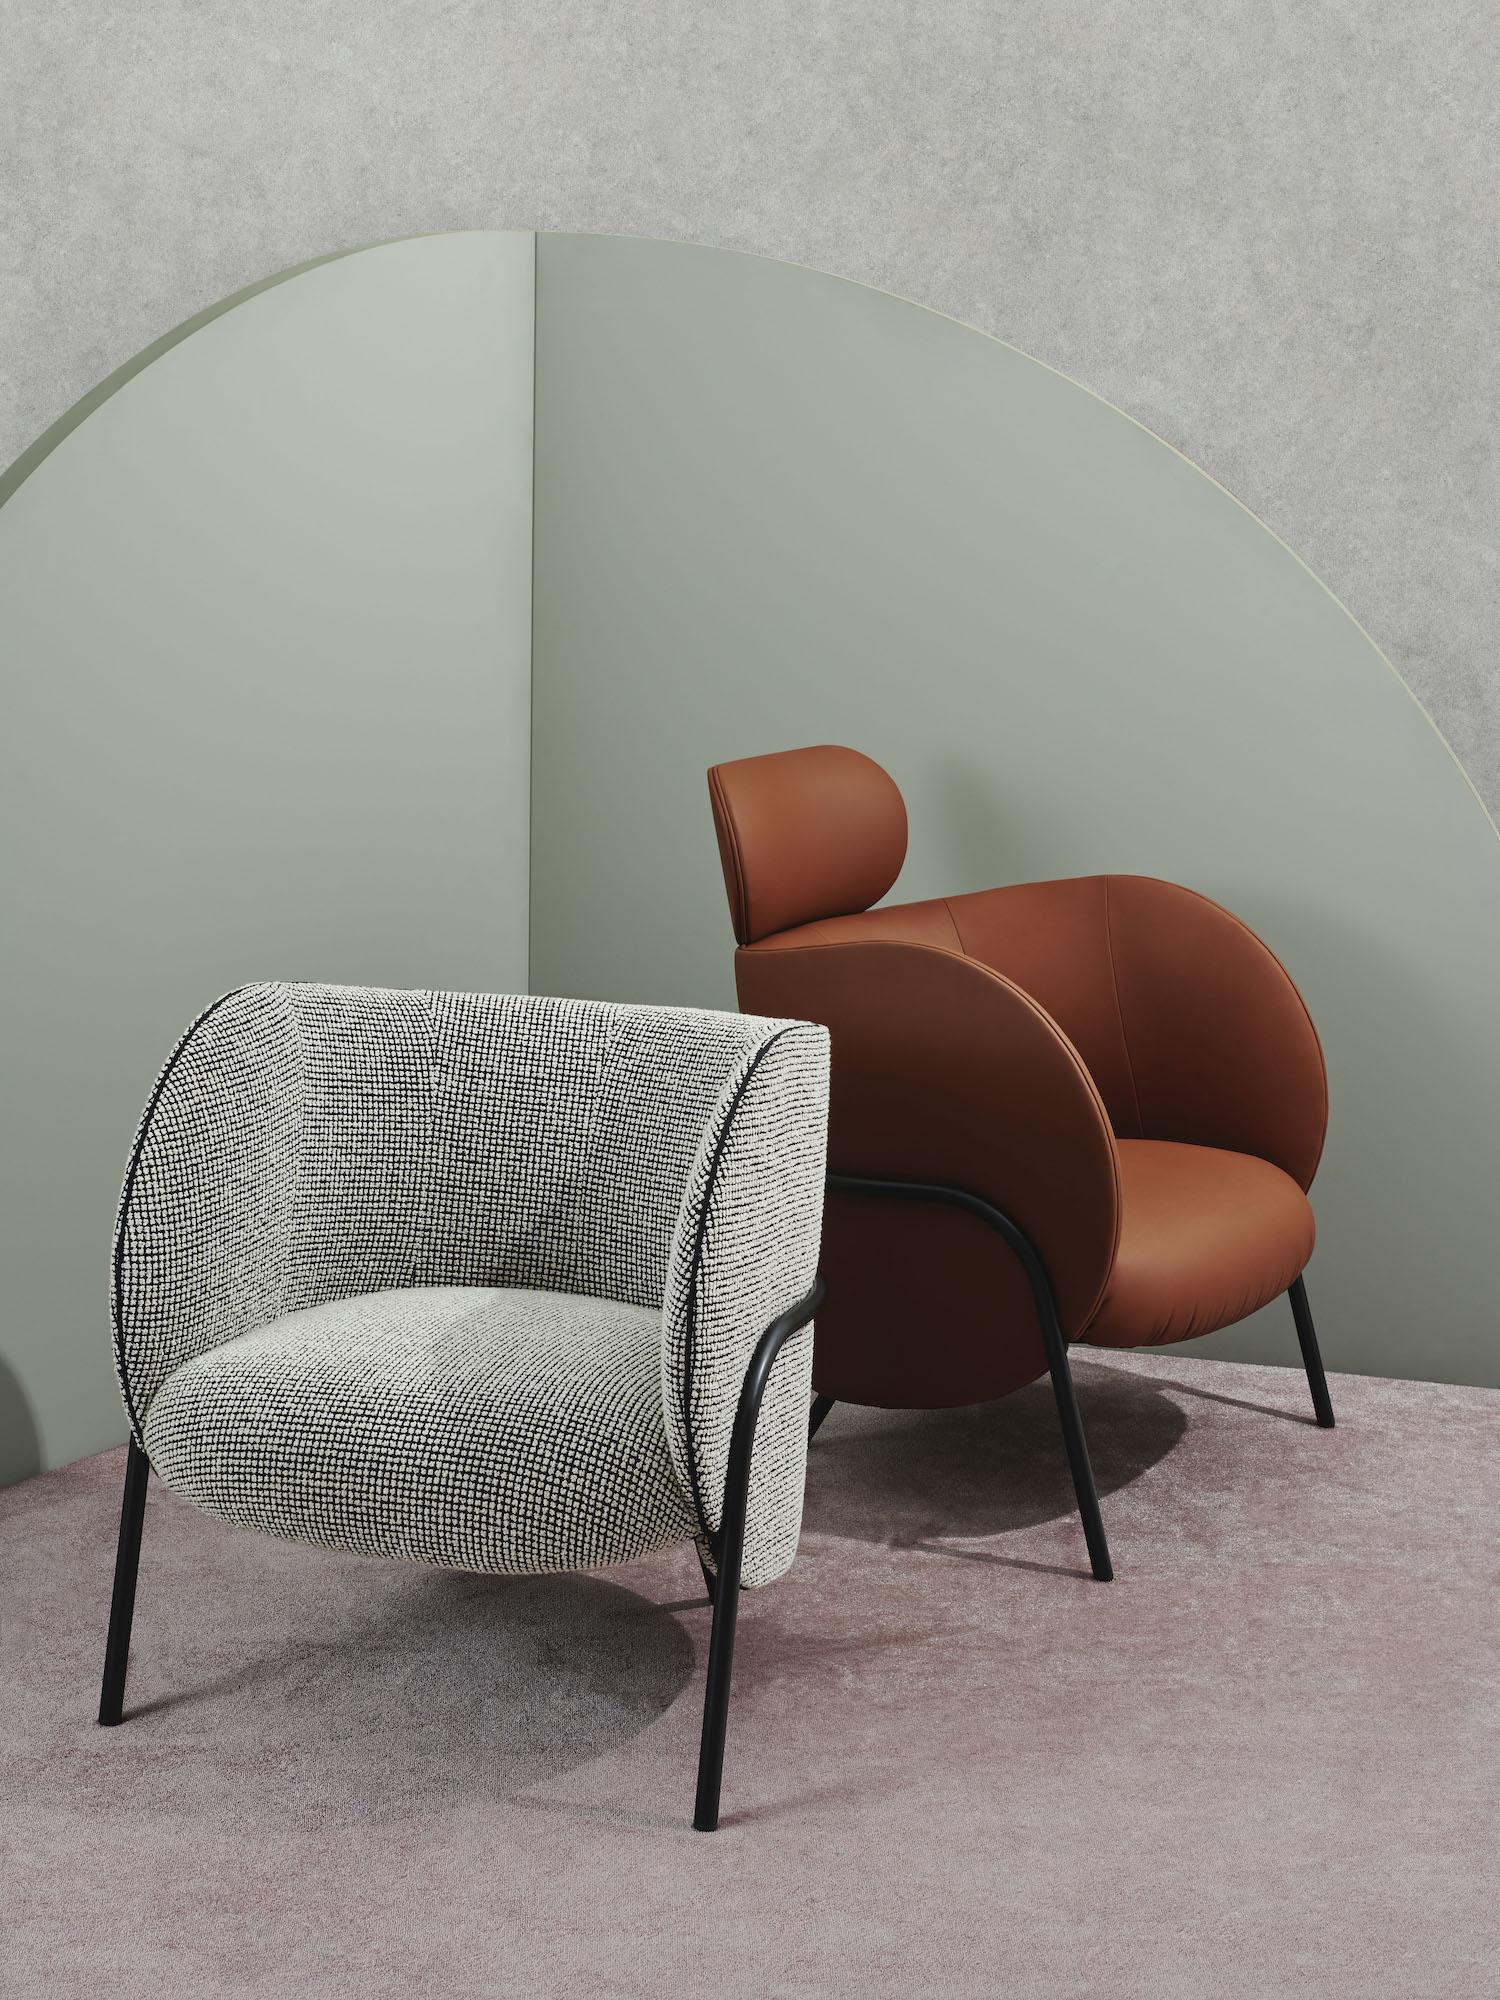 est living royce armchair nikolai kotlarczyk spo1 4